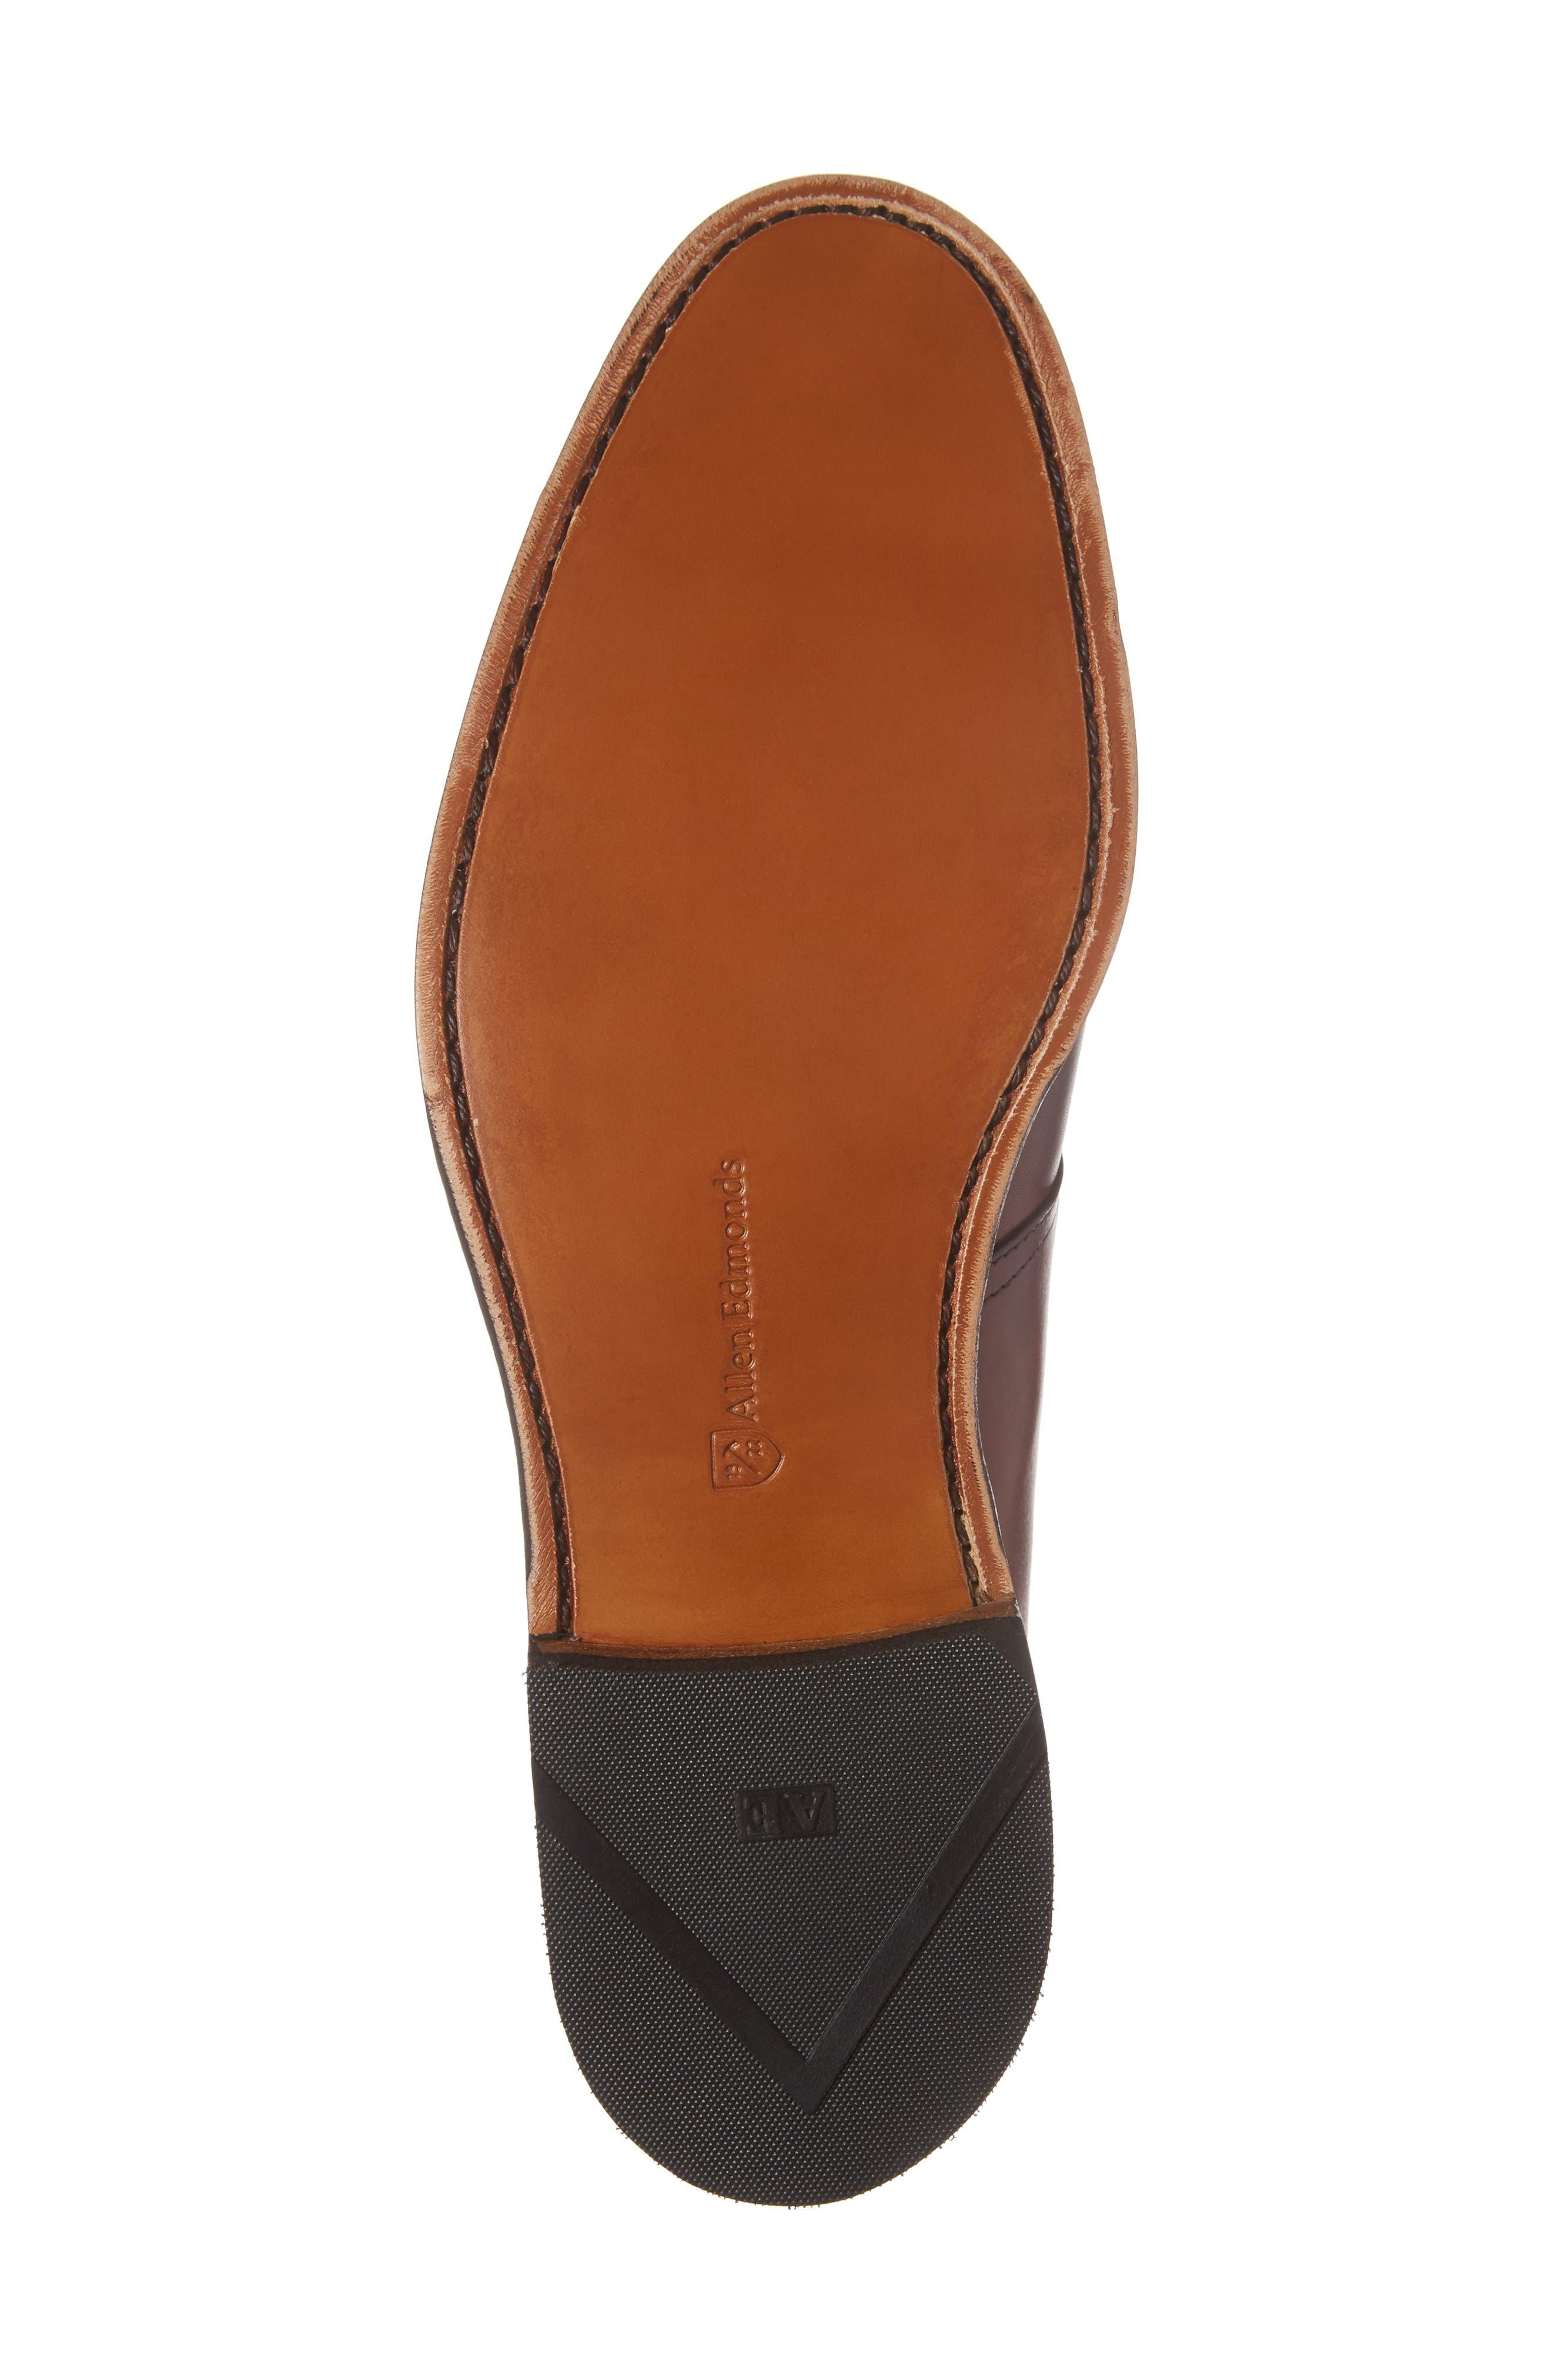 Warwick Monk Strap Shoe,                             Alternate thumbnail 6, color,                             Oxblood Leather